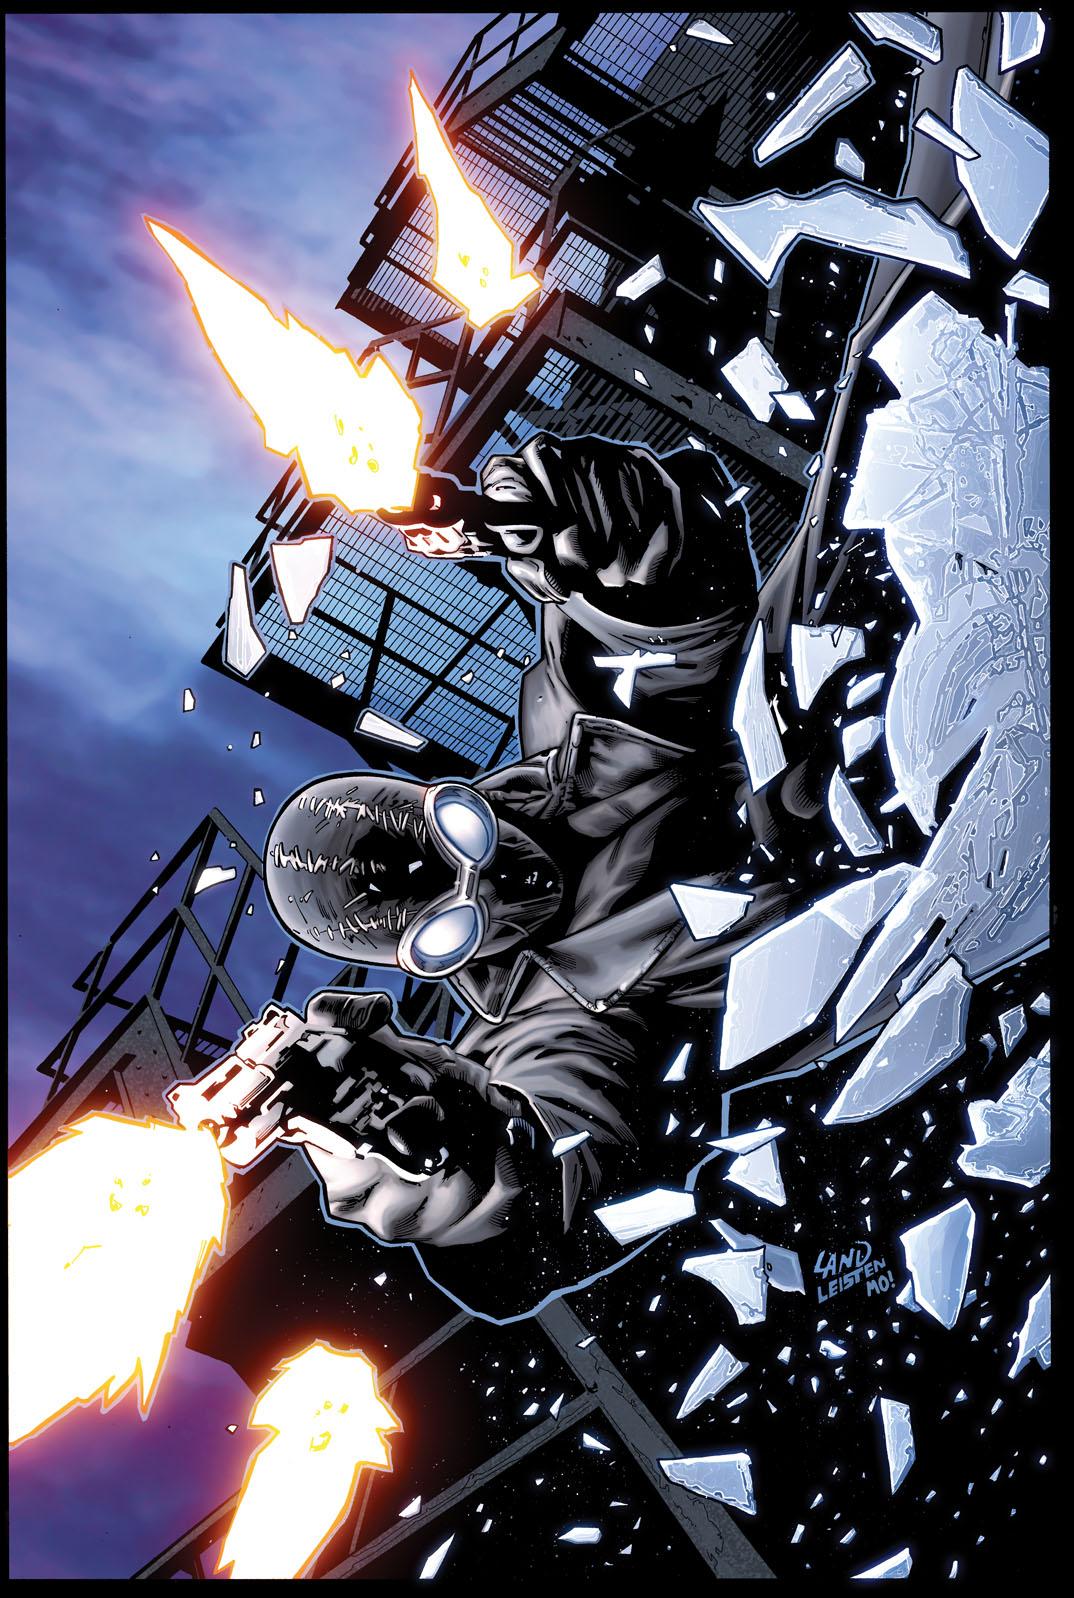 the return of spider man noir your first look at edge of spider verse 1 comicsrefueled. Black Bedroom Furniture Sets. Home Design Ideas